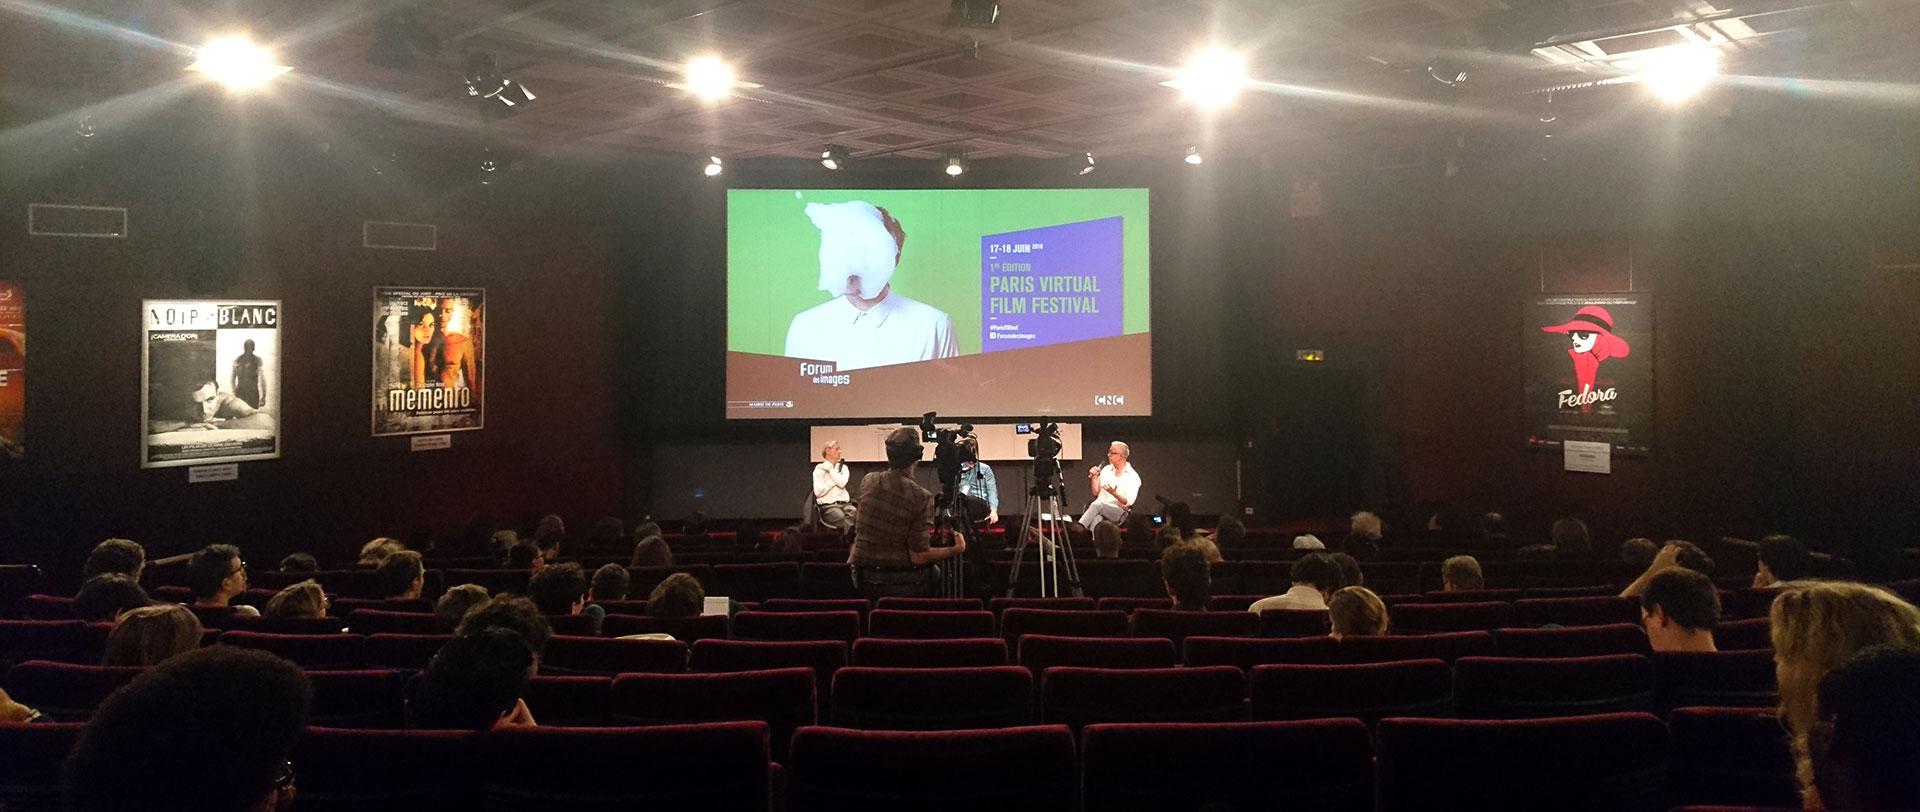 "Conférence ""L'avenir de la VR"" avec Morgan Bouchet (@morganbouchet), Michel Reilhac @michelreilhac et Philippe Fuchs"